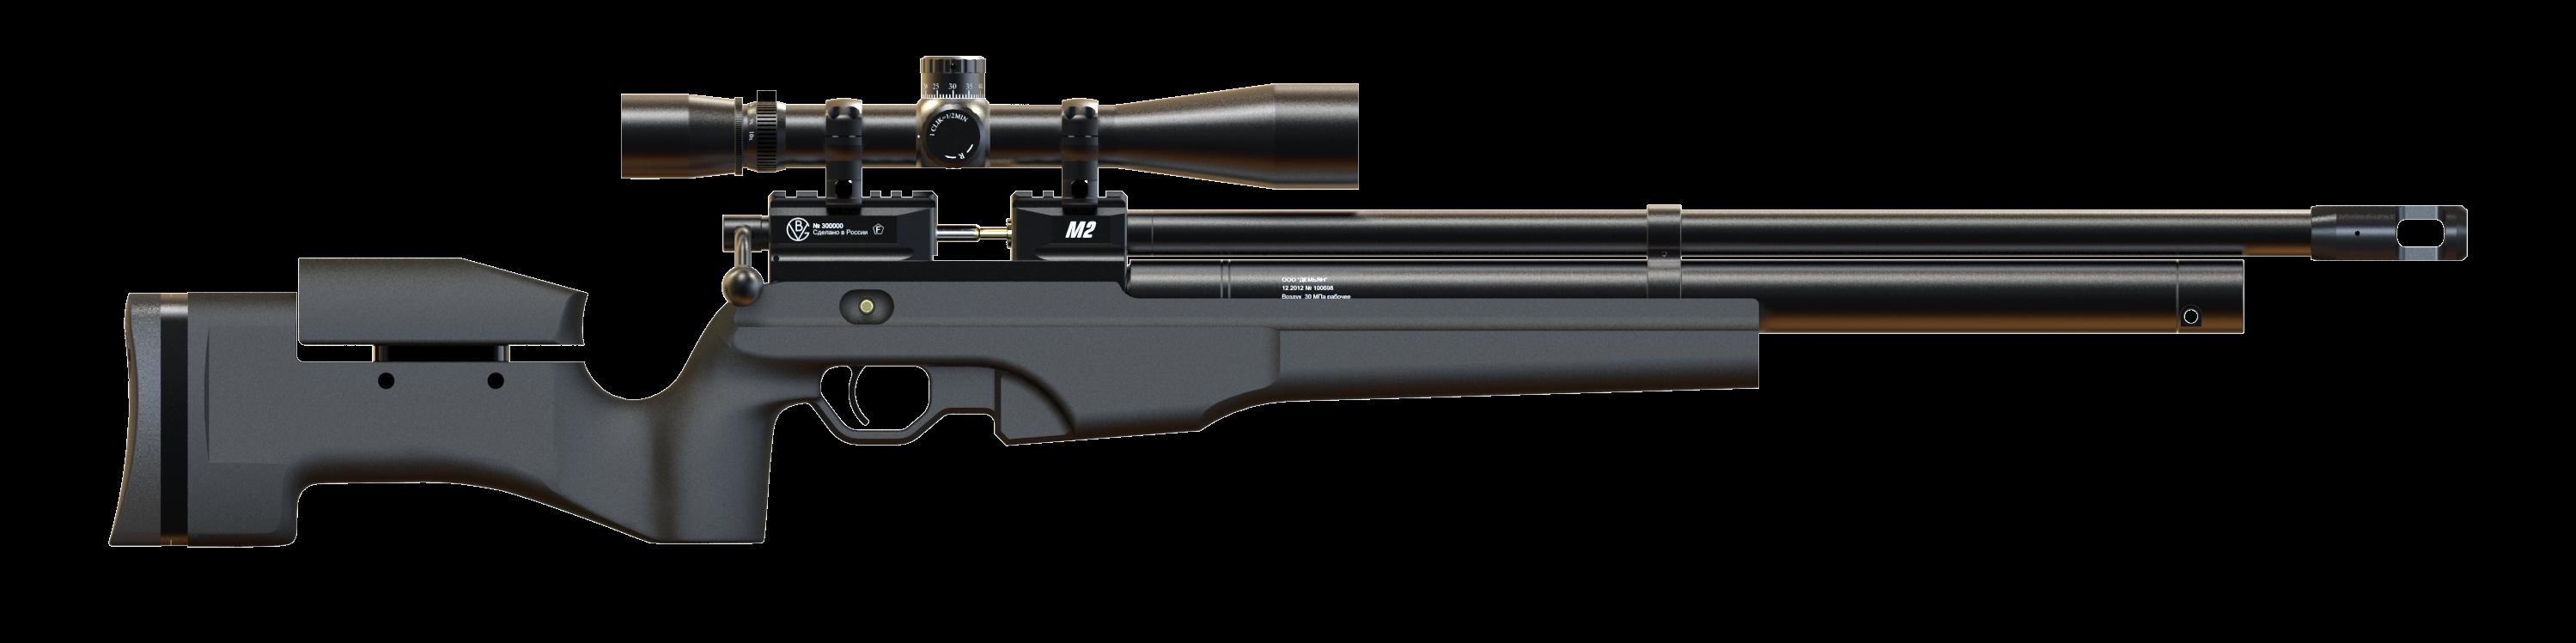 Classic Sniper Png Image Sniper Classic Png Photo